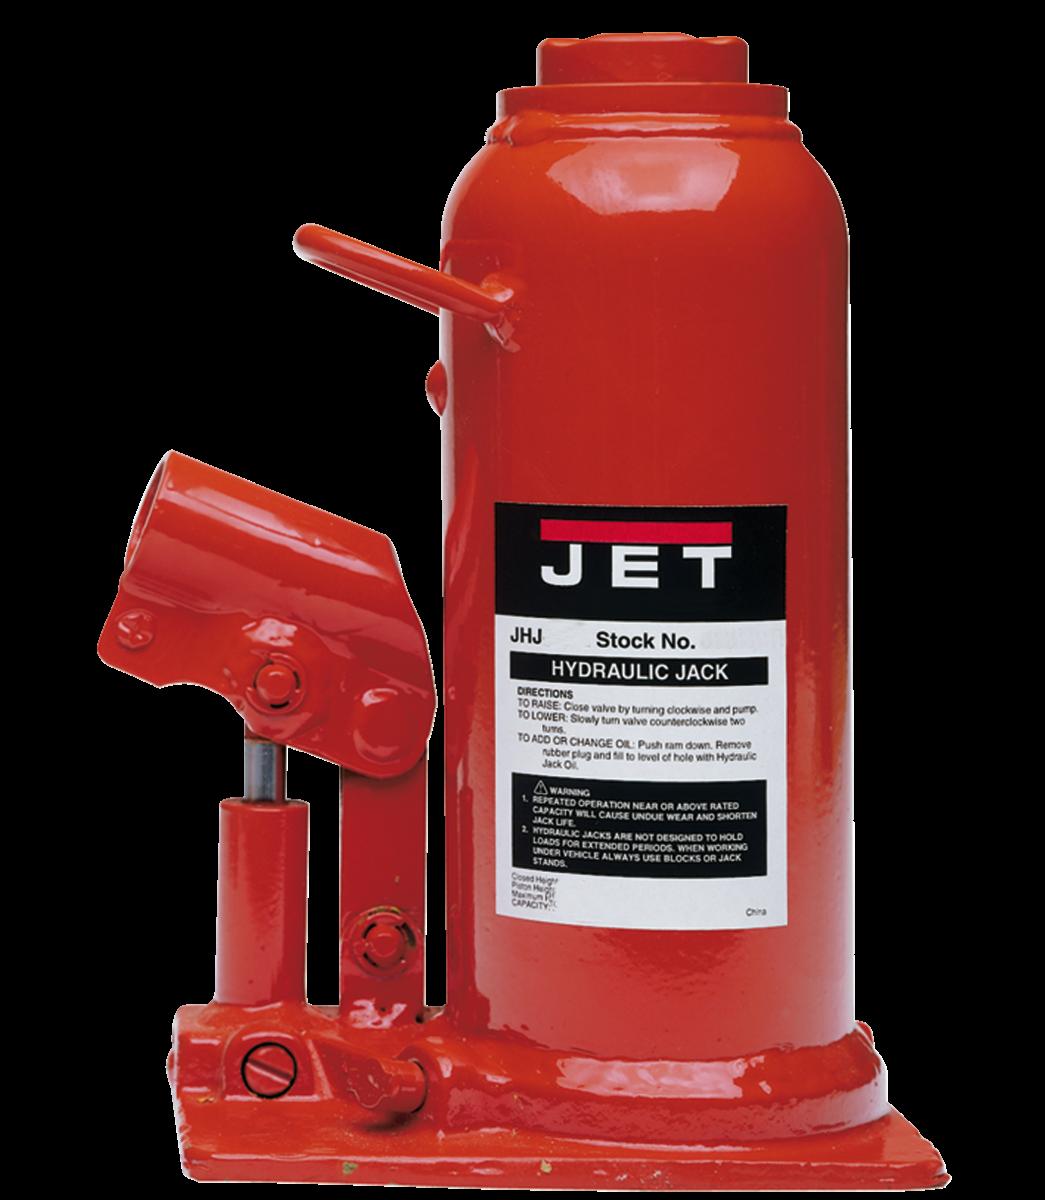 JHJ-35, 35-Ton Hydraulic Bottle Jack